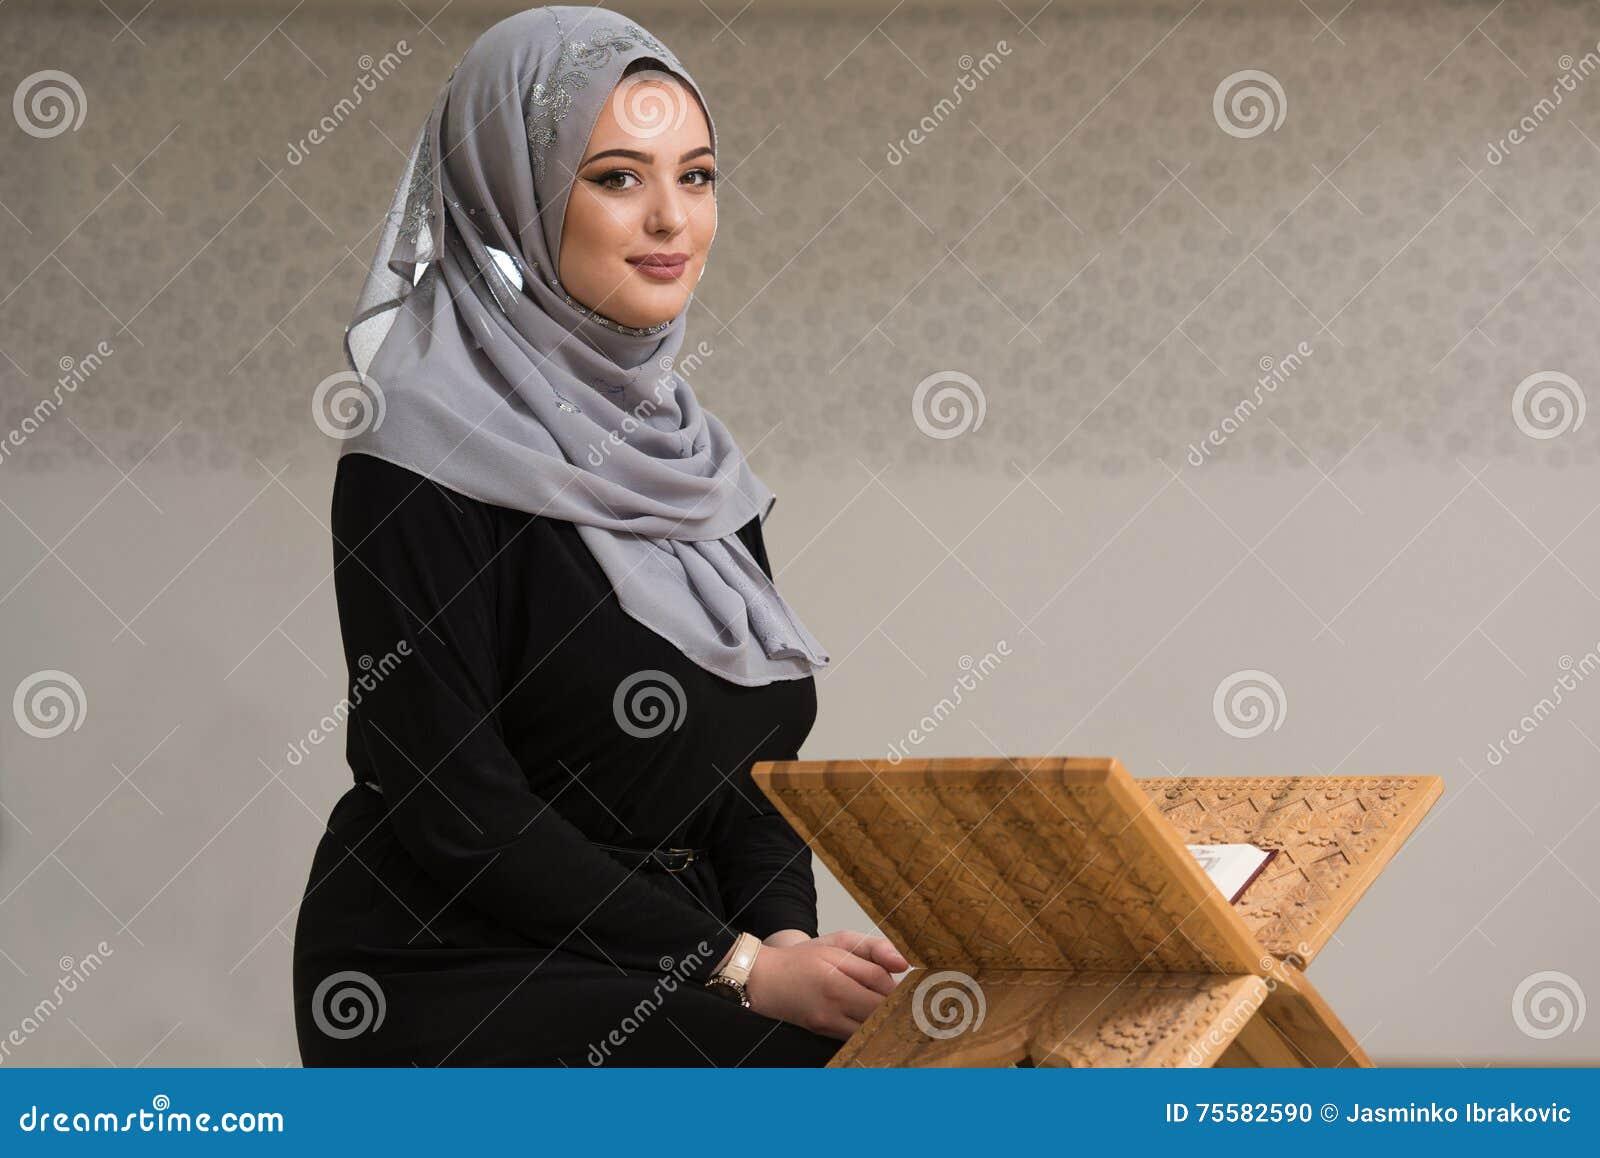 muslim single women in reading Single pietermaritzburg muslim women interested in muslim dating looking for pietermaritzburg muslim women browse the latest members below to find your ideal date.